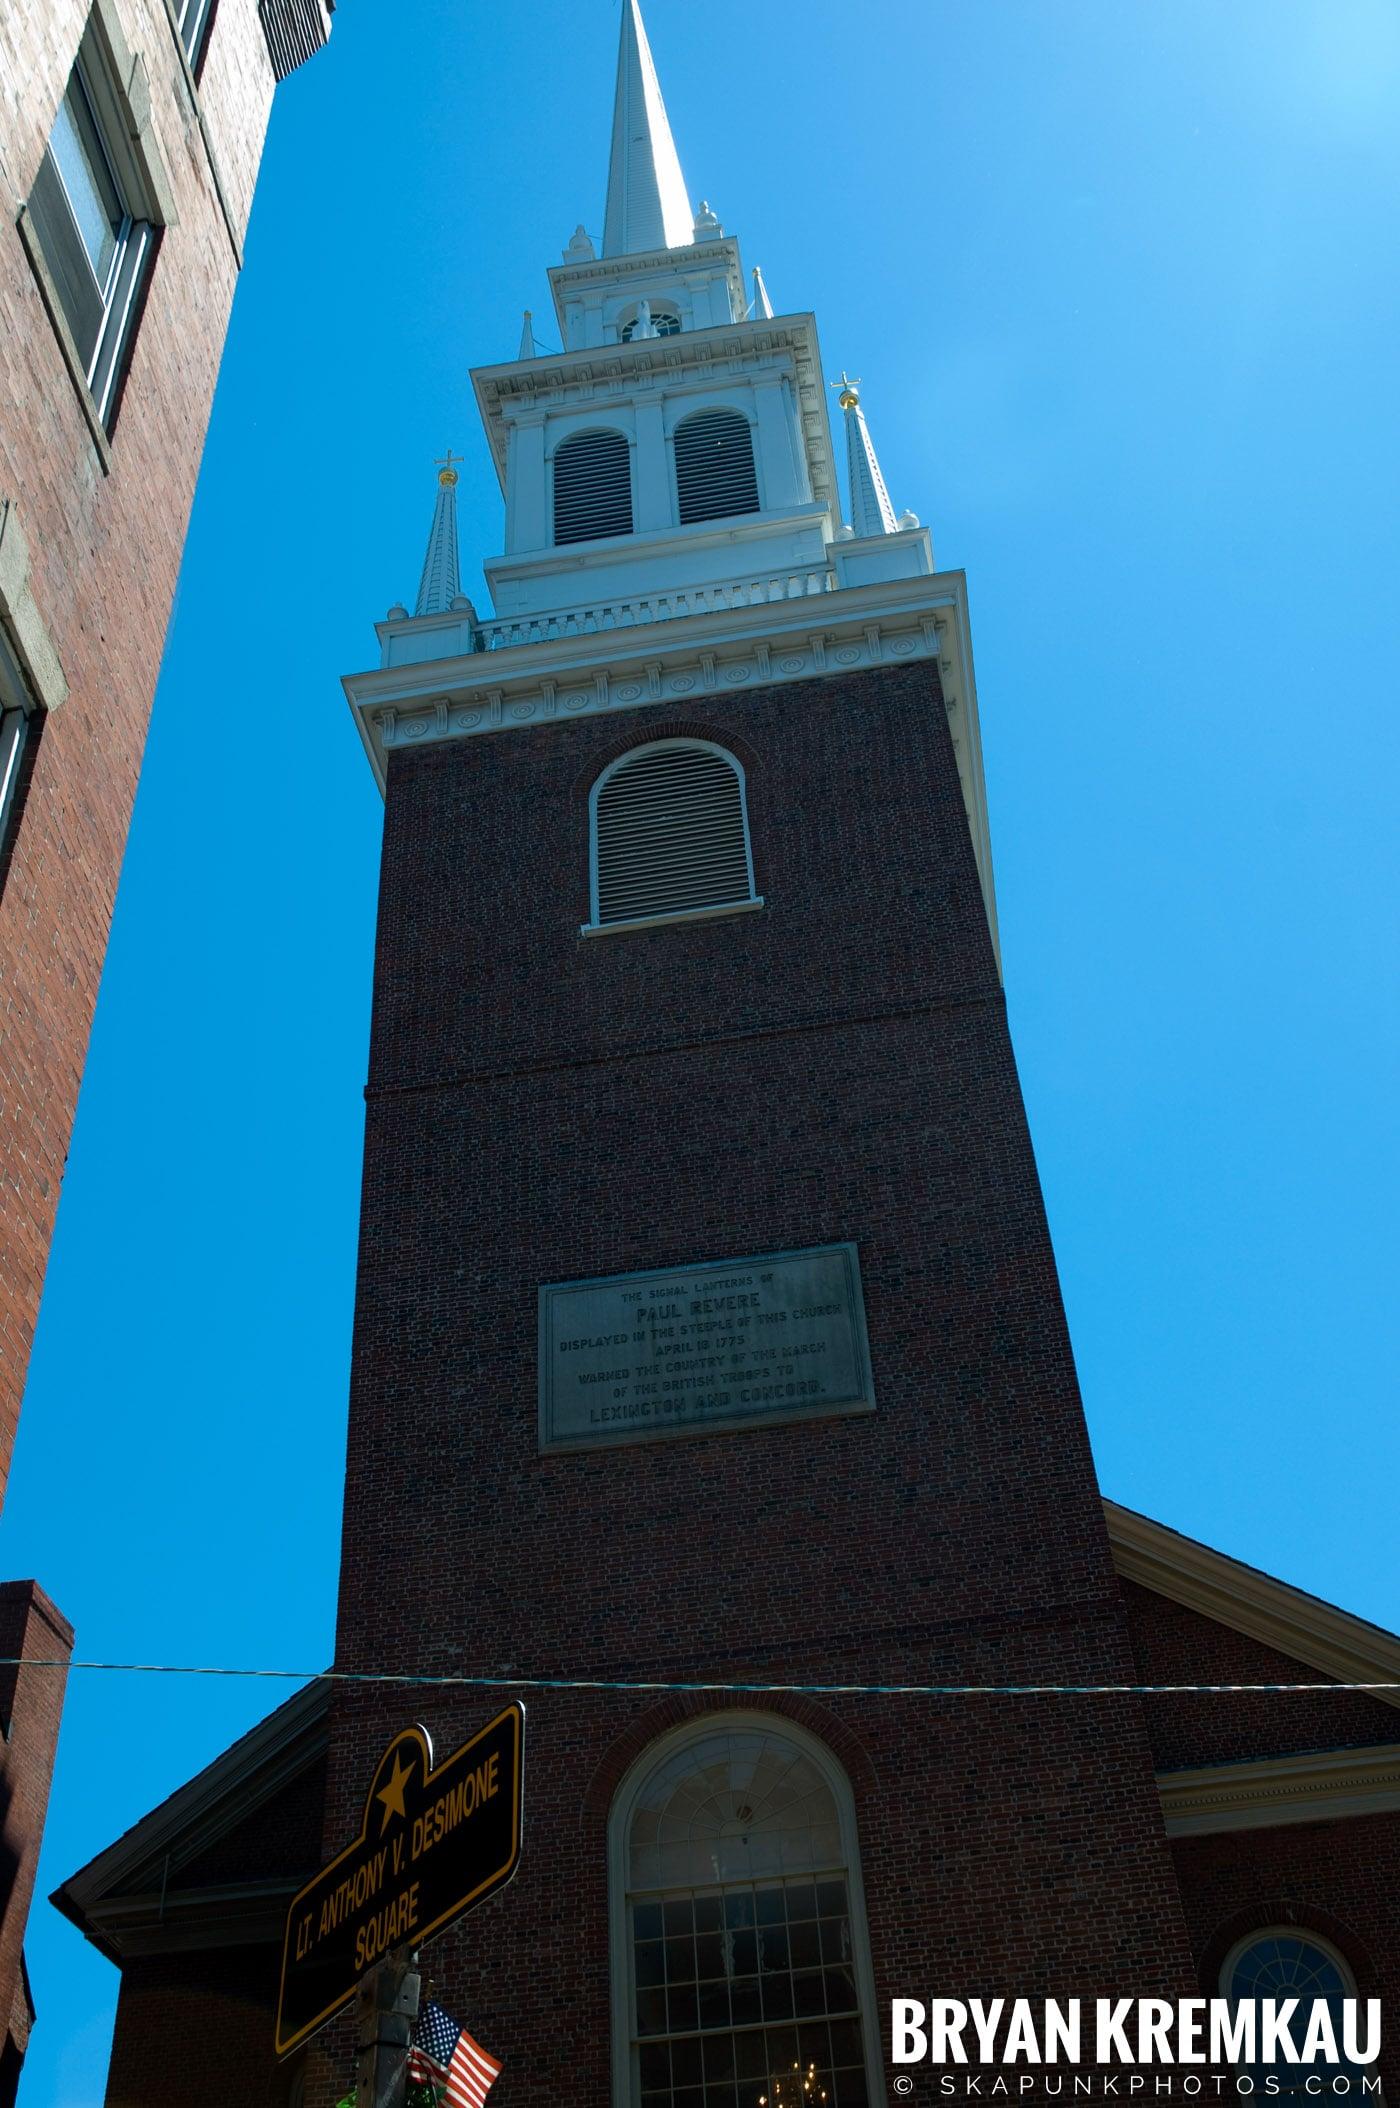 Memorial Day Weekend Trip to Boston - 5.25.08 (16)